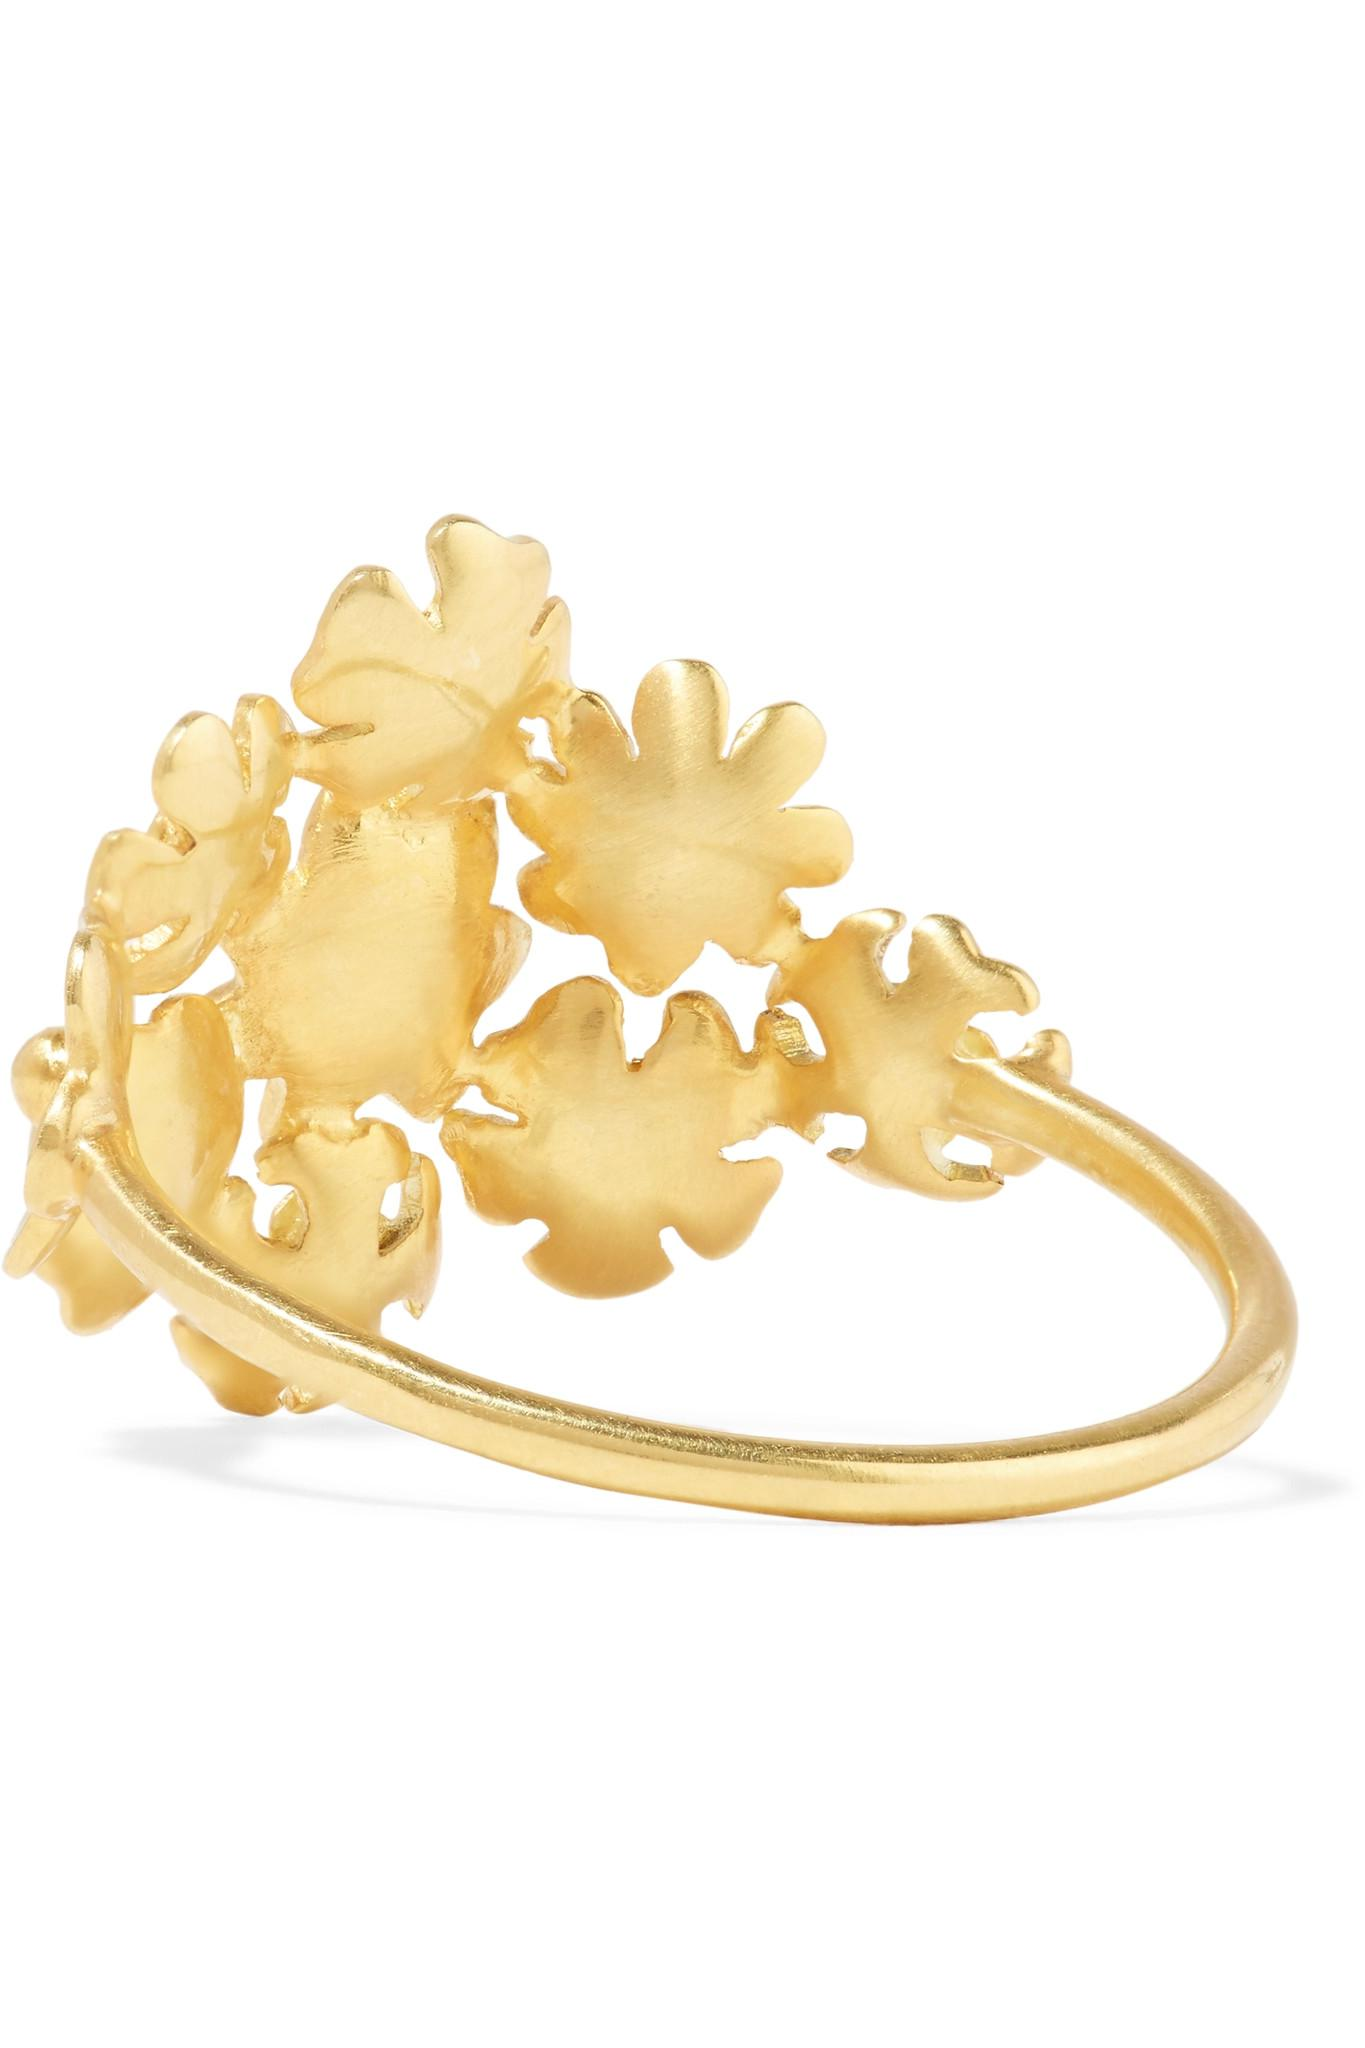 Pippa Small 18-karat Gold Ring qr54ol32b